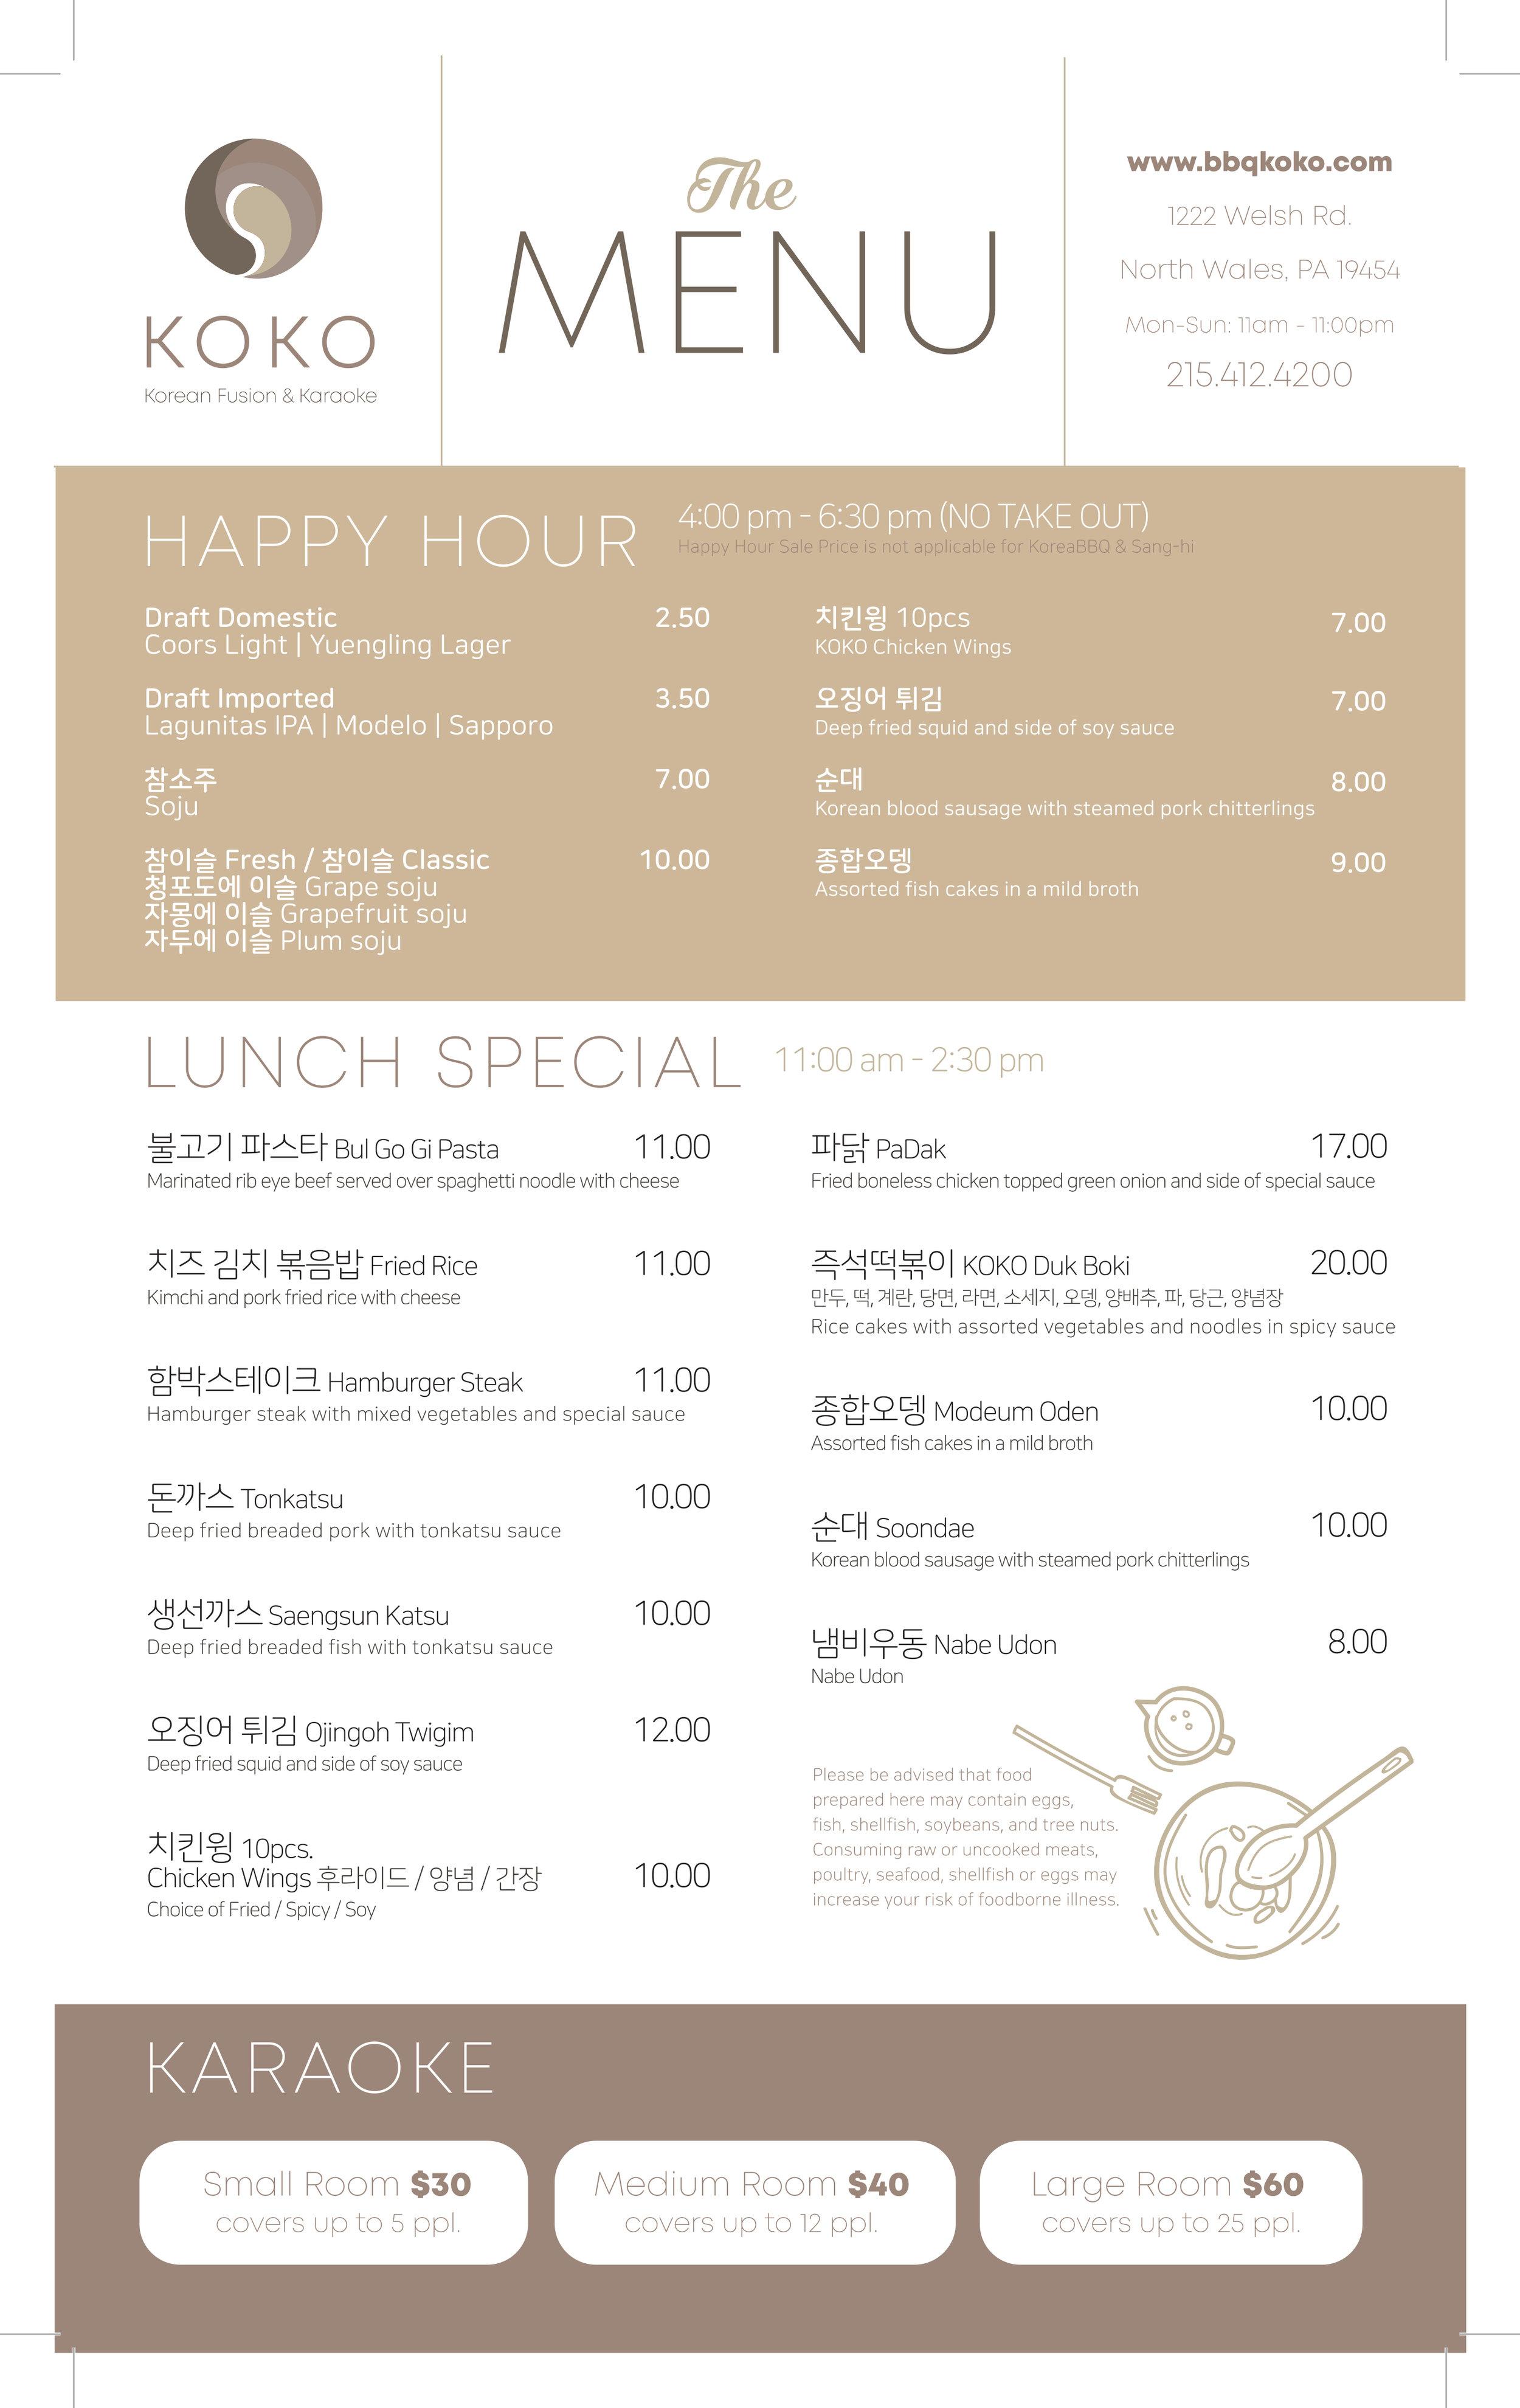 KOKO_Menu_lunch_0129-2.jpg